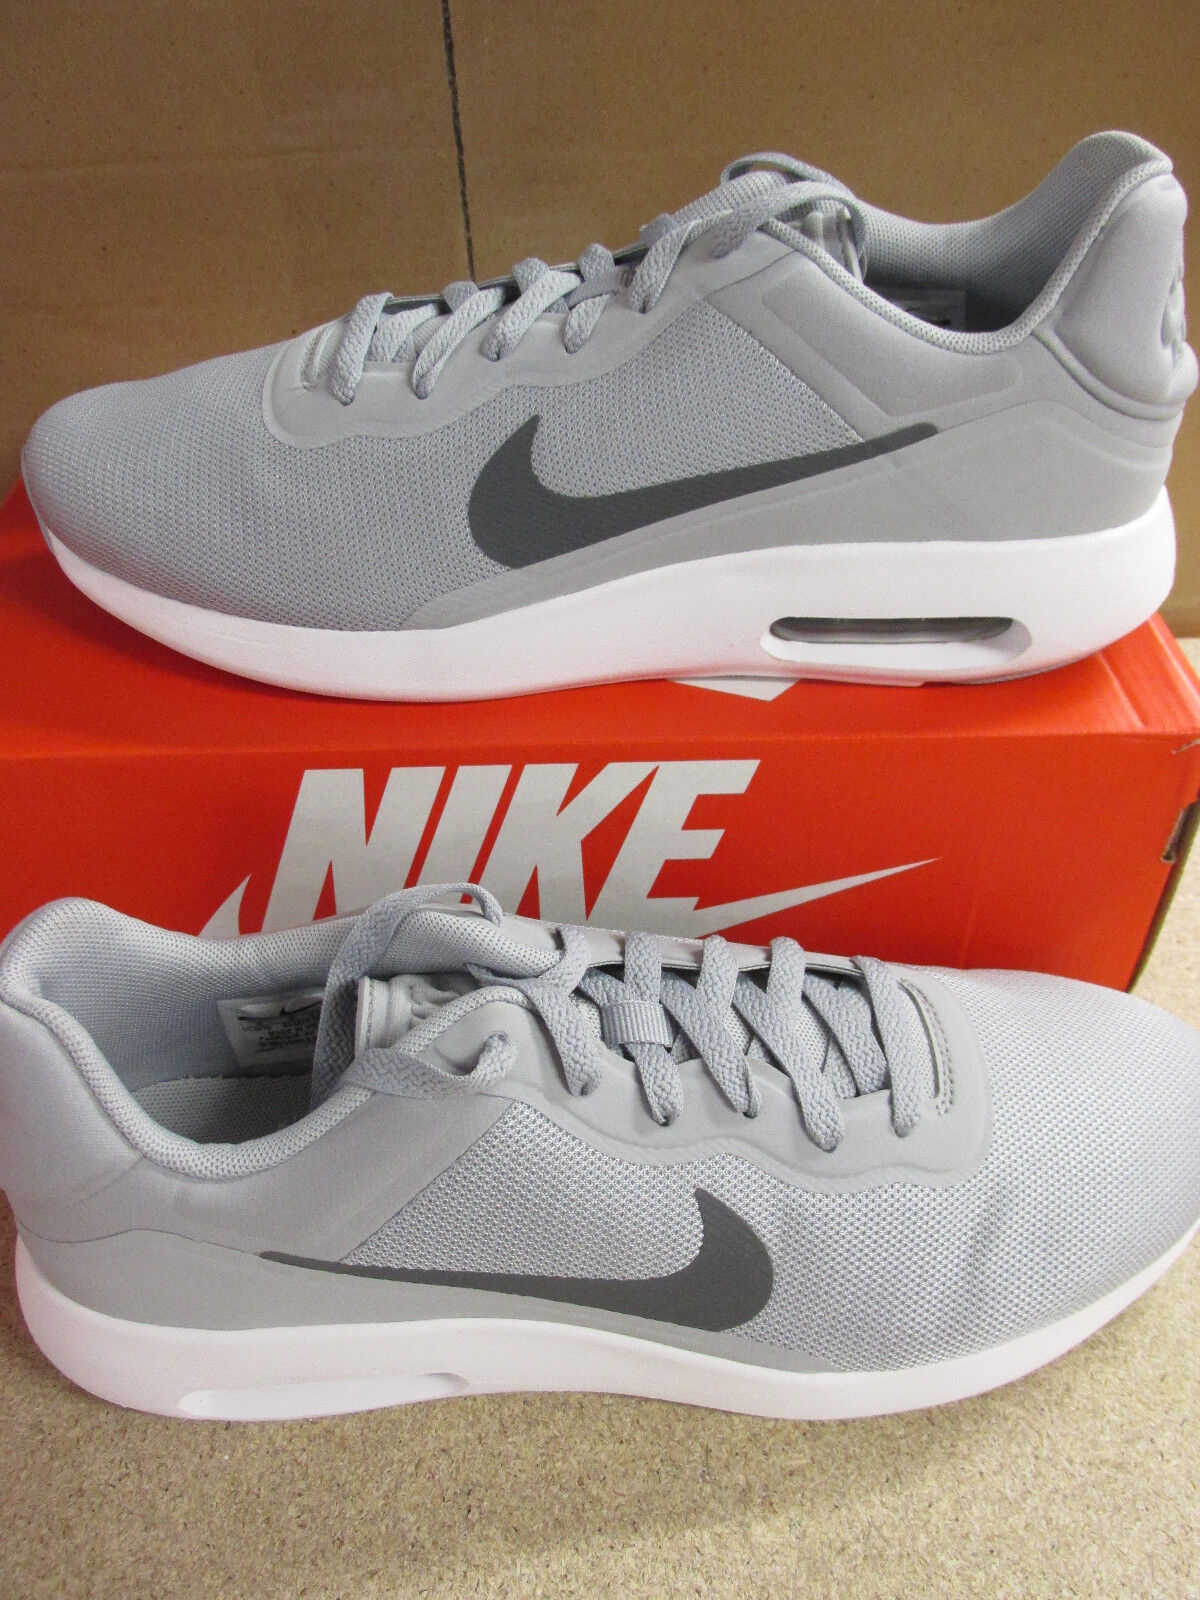 Nike air max modern essential mens running trainers 844874 002 Turnschuhe schuhe